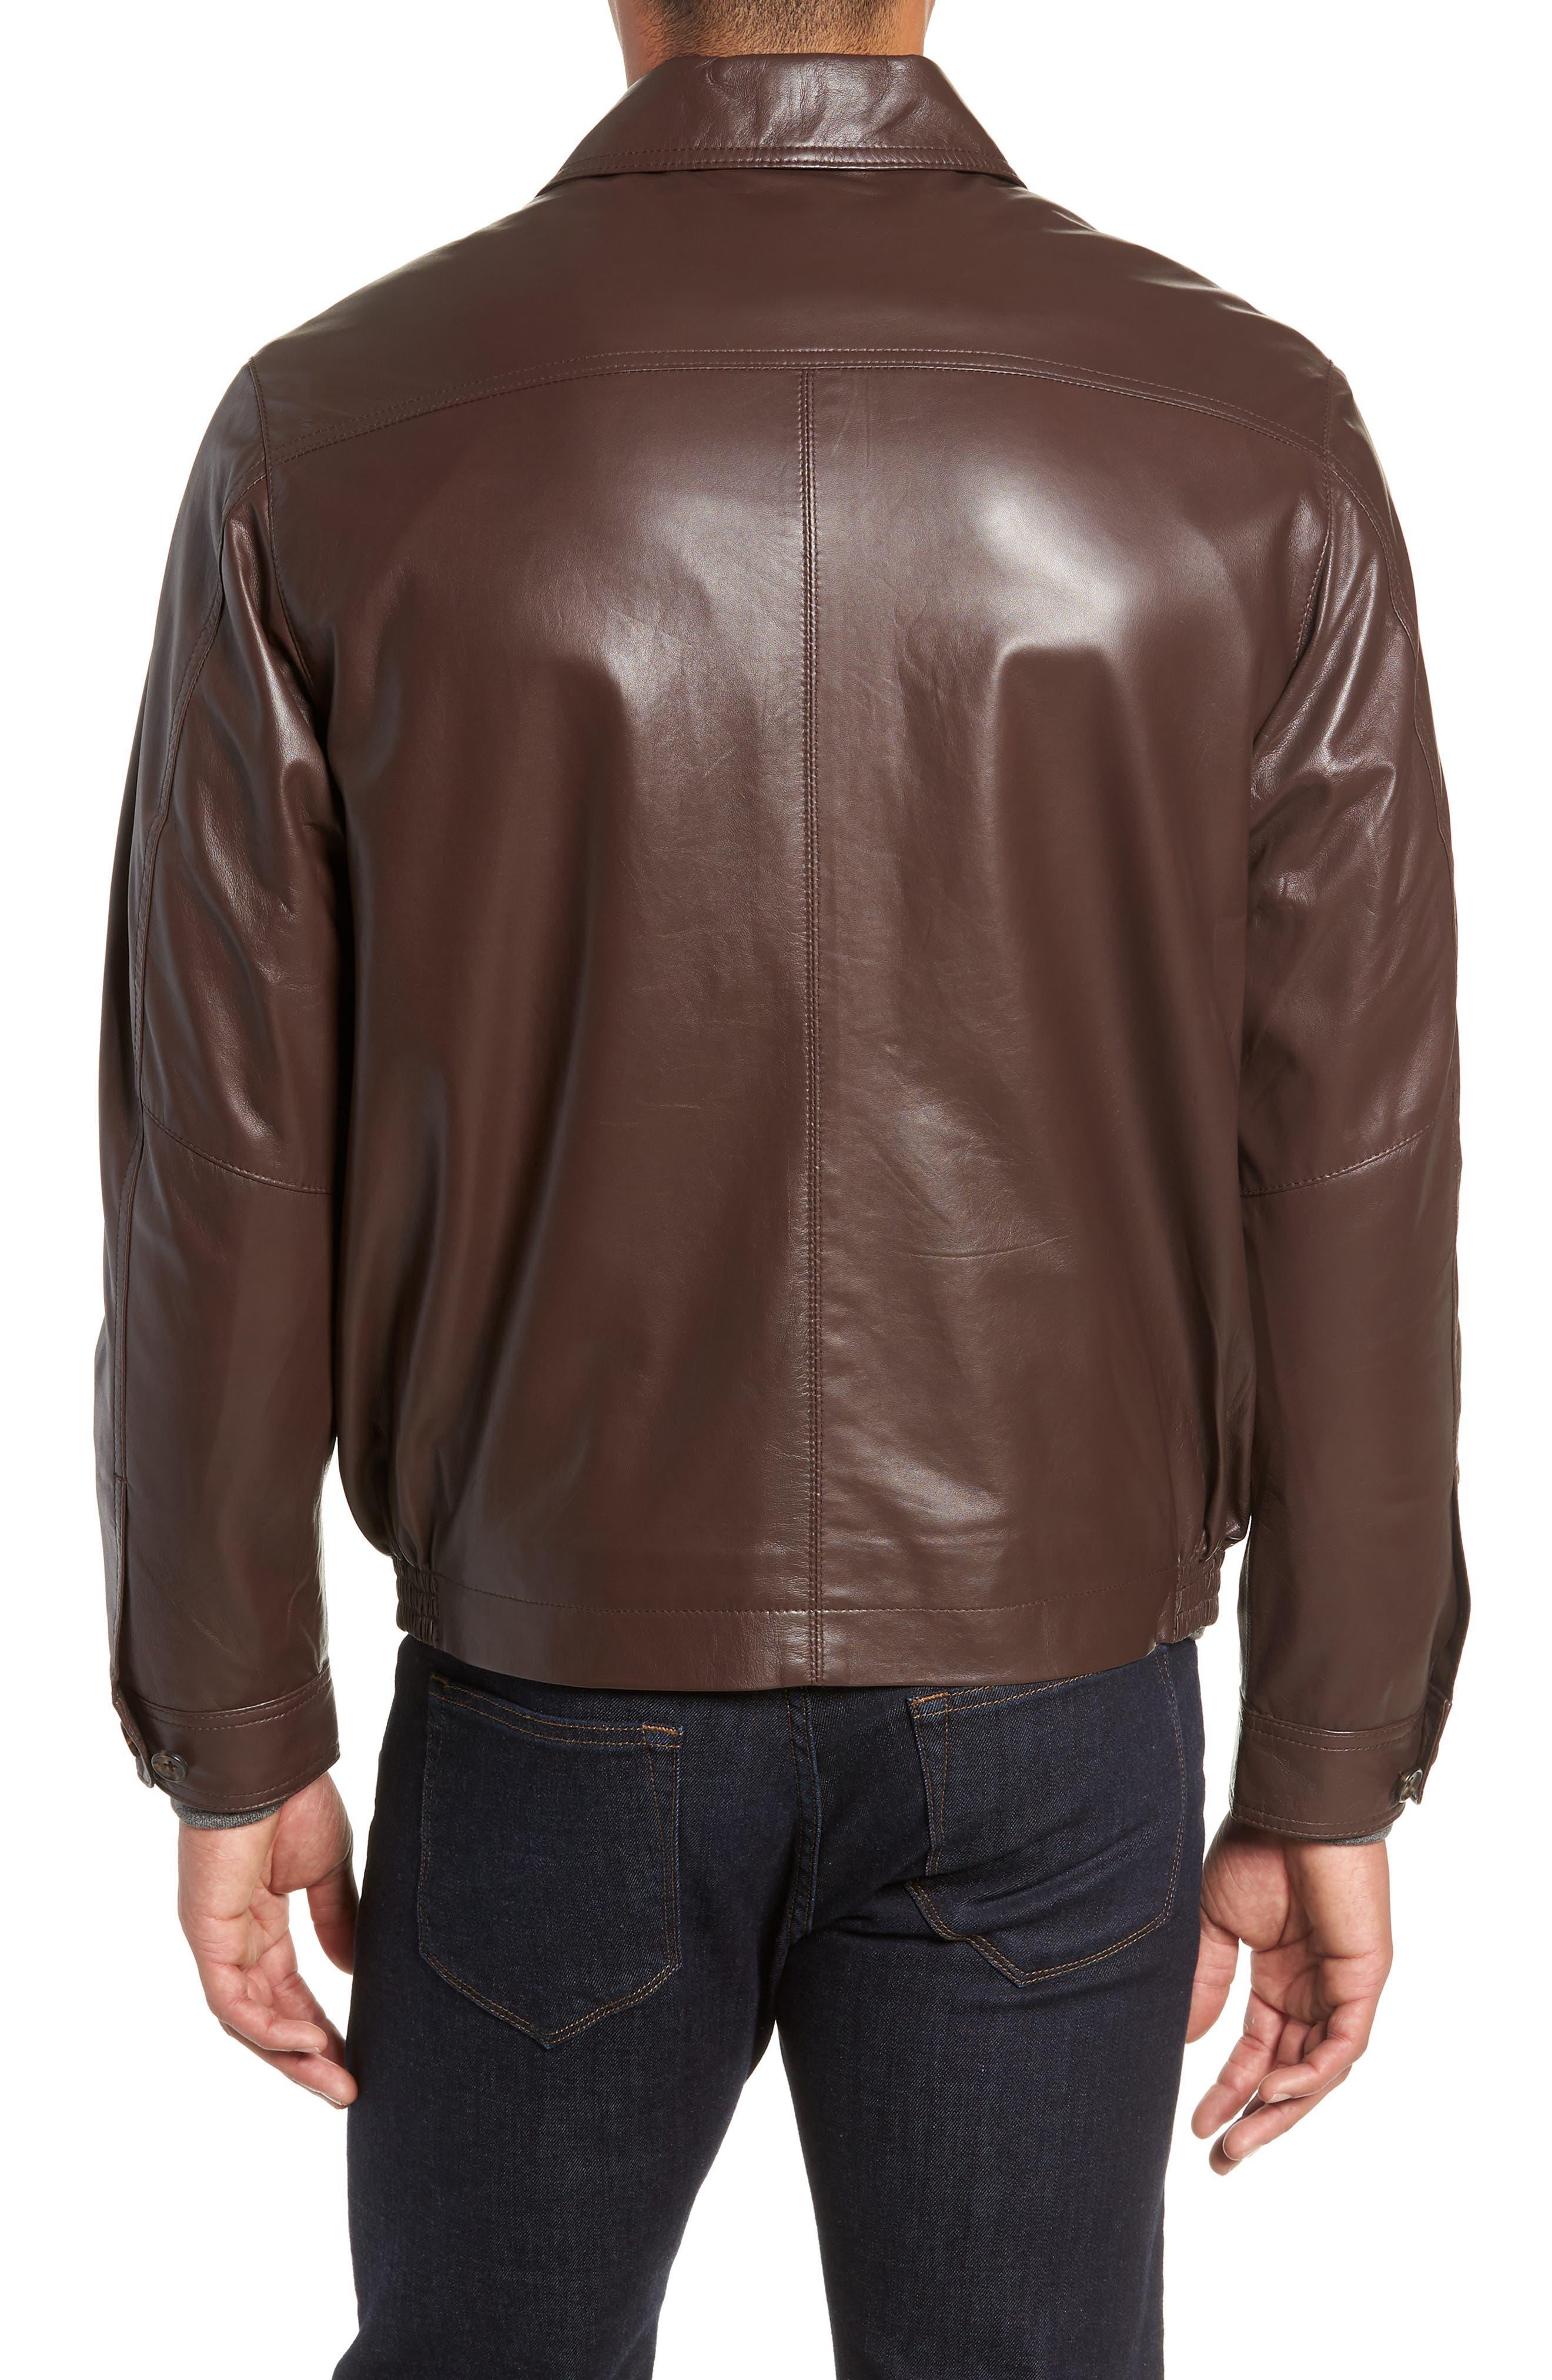 GOLDEN BEAR,                             The Bartlett Leather Jacket,                             Alternate thumbnail 2, color,                             DARK BROWN